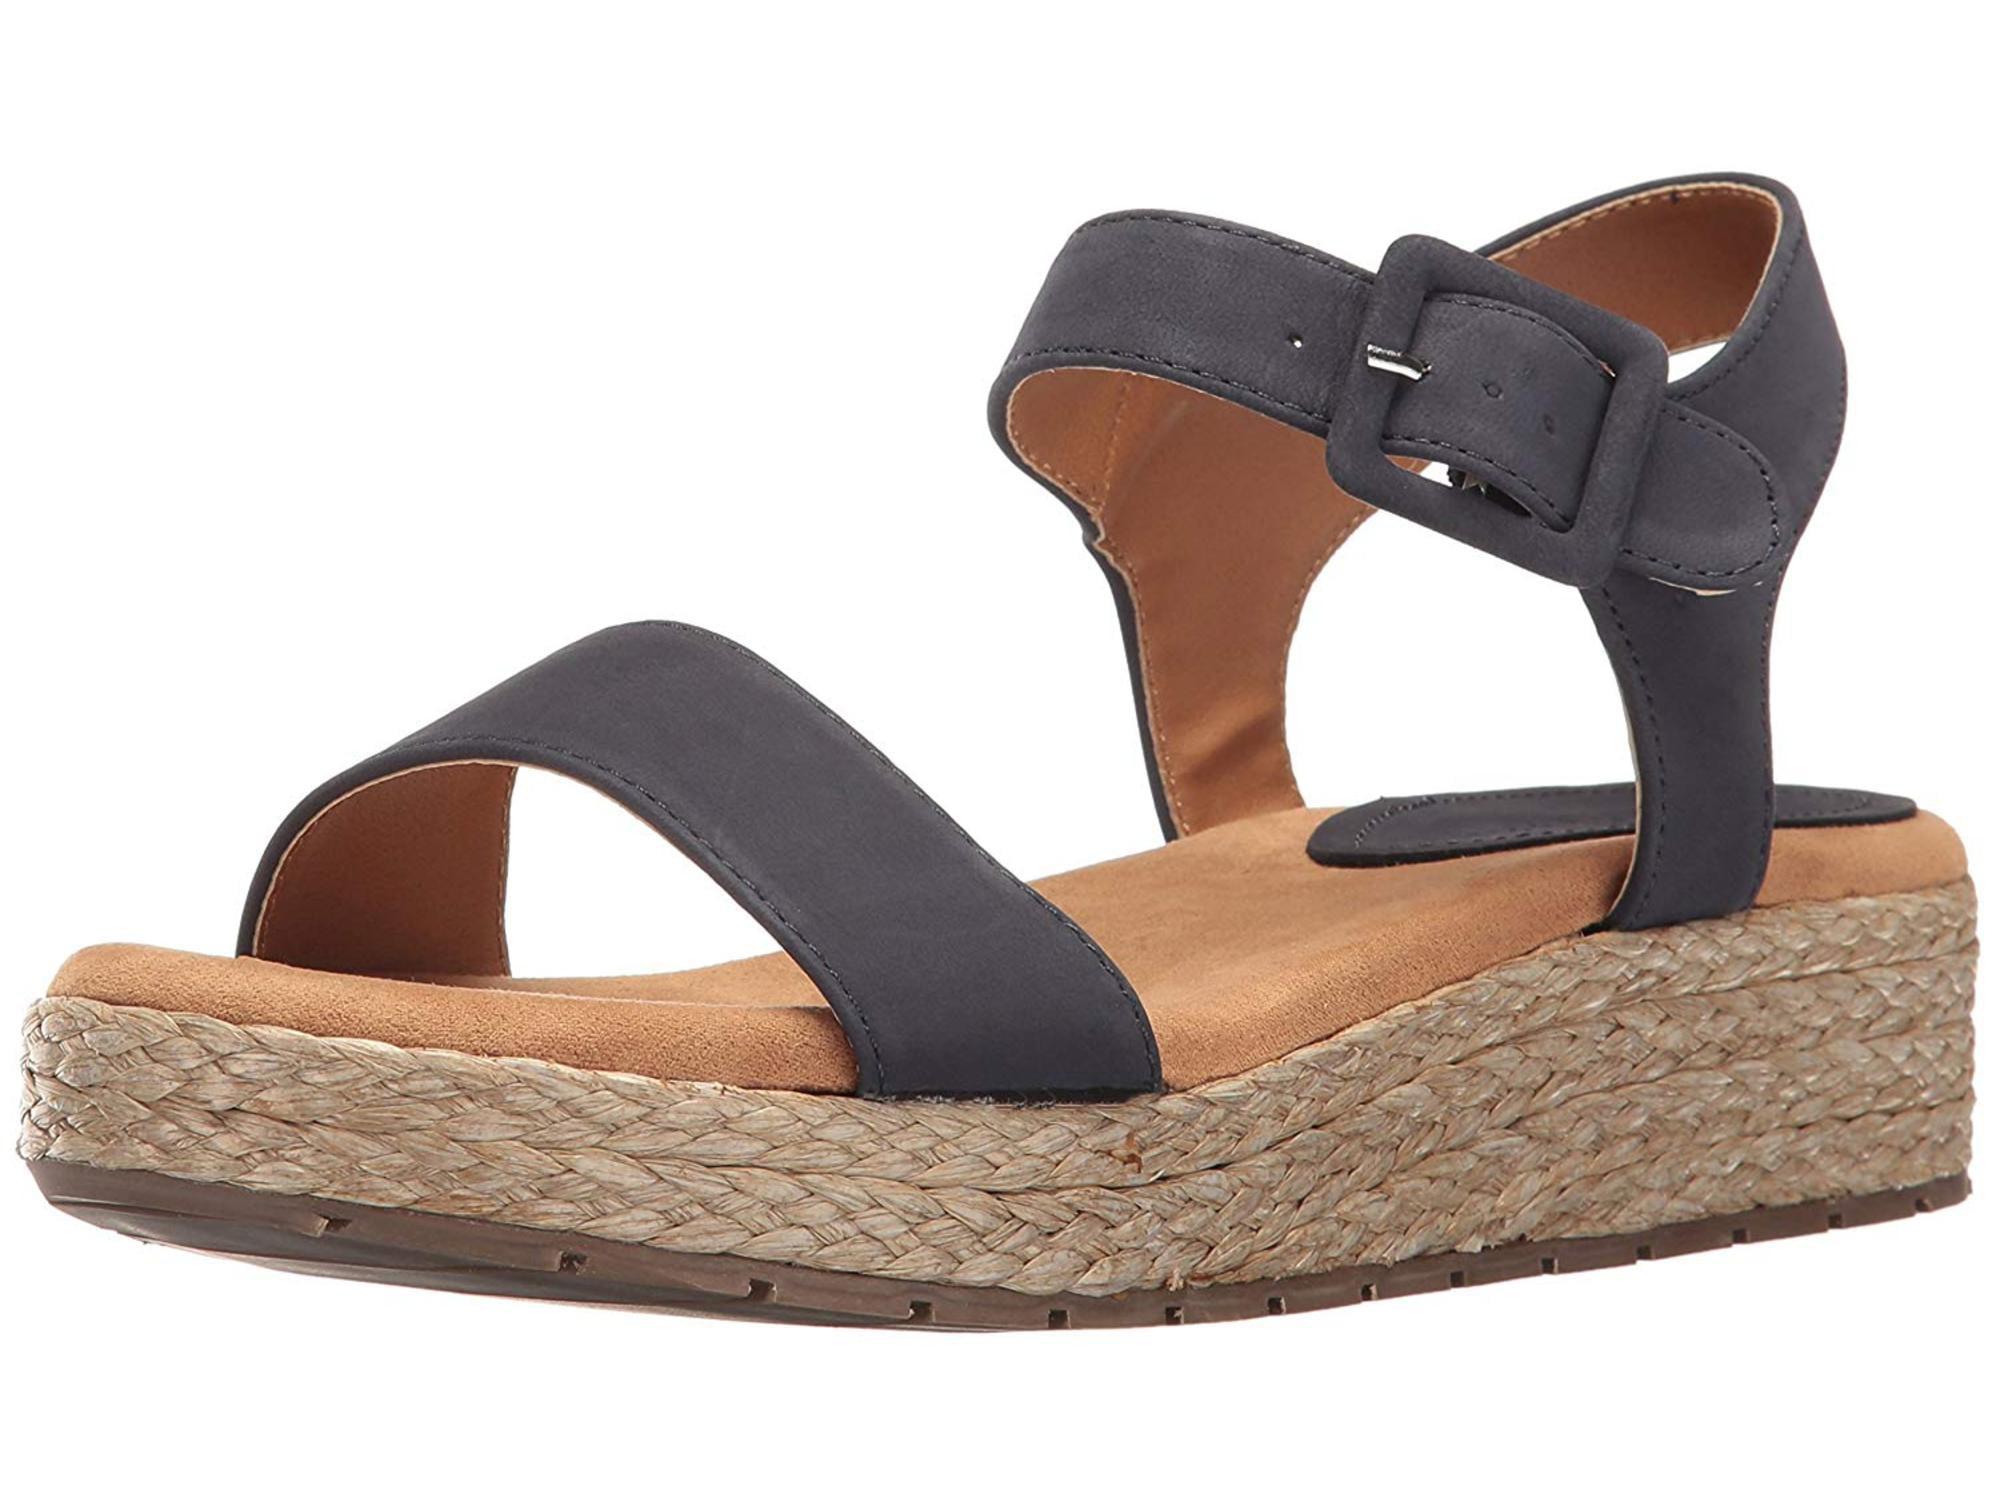 6a8e87e2a6a Kenneth Cole REACTION Women s Calm Water Platform Sandal ...